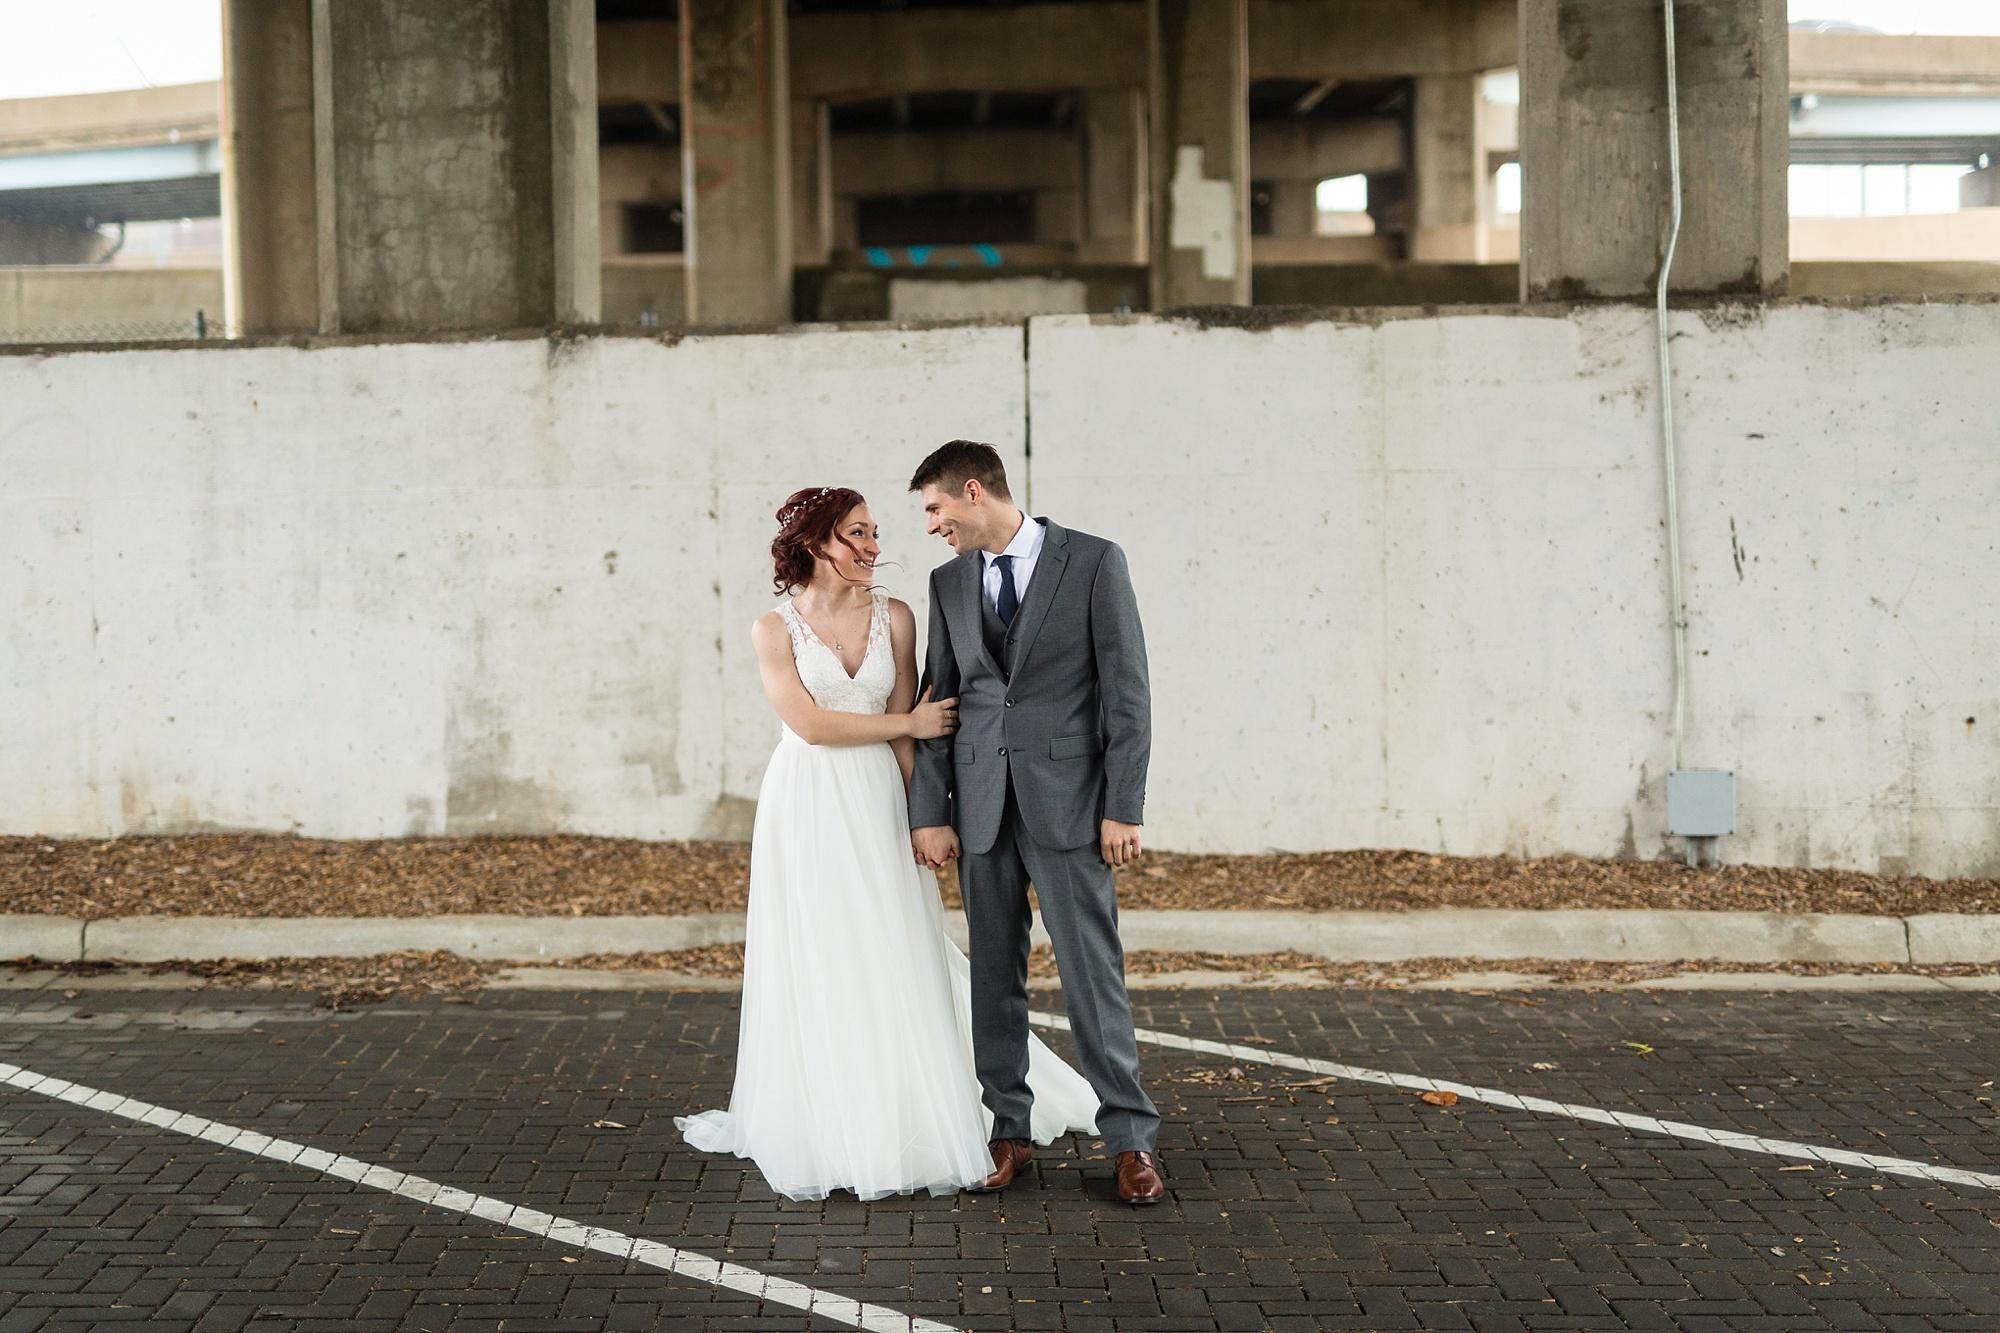 Brandon_Shafer_Photography_Lauren_Ethan_New_Vintage_Place_Grand_Rapids_Wedding_0024.jpg